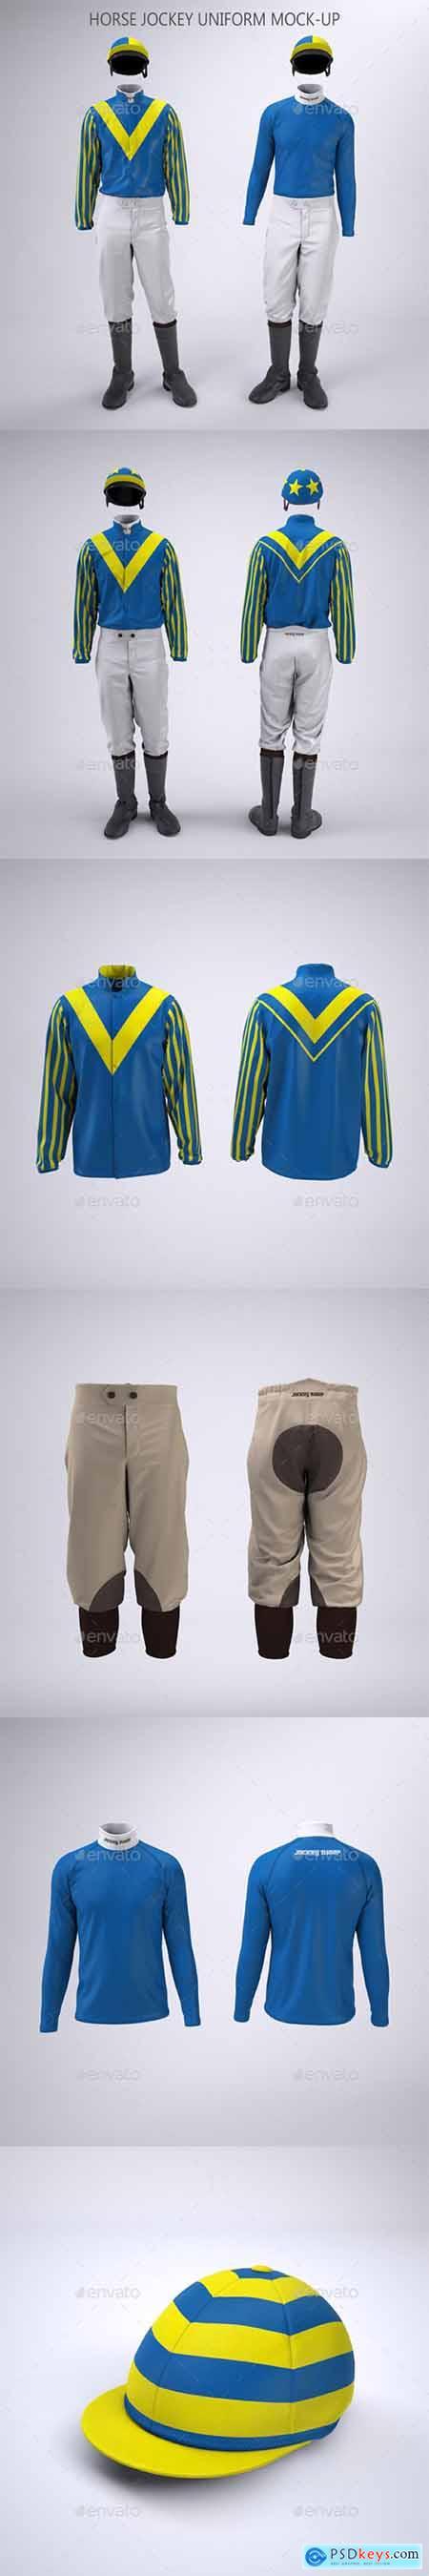 Horse Racing Jockey Uniform Mock-Up 32770535